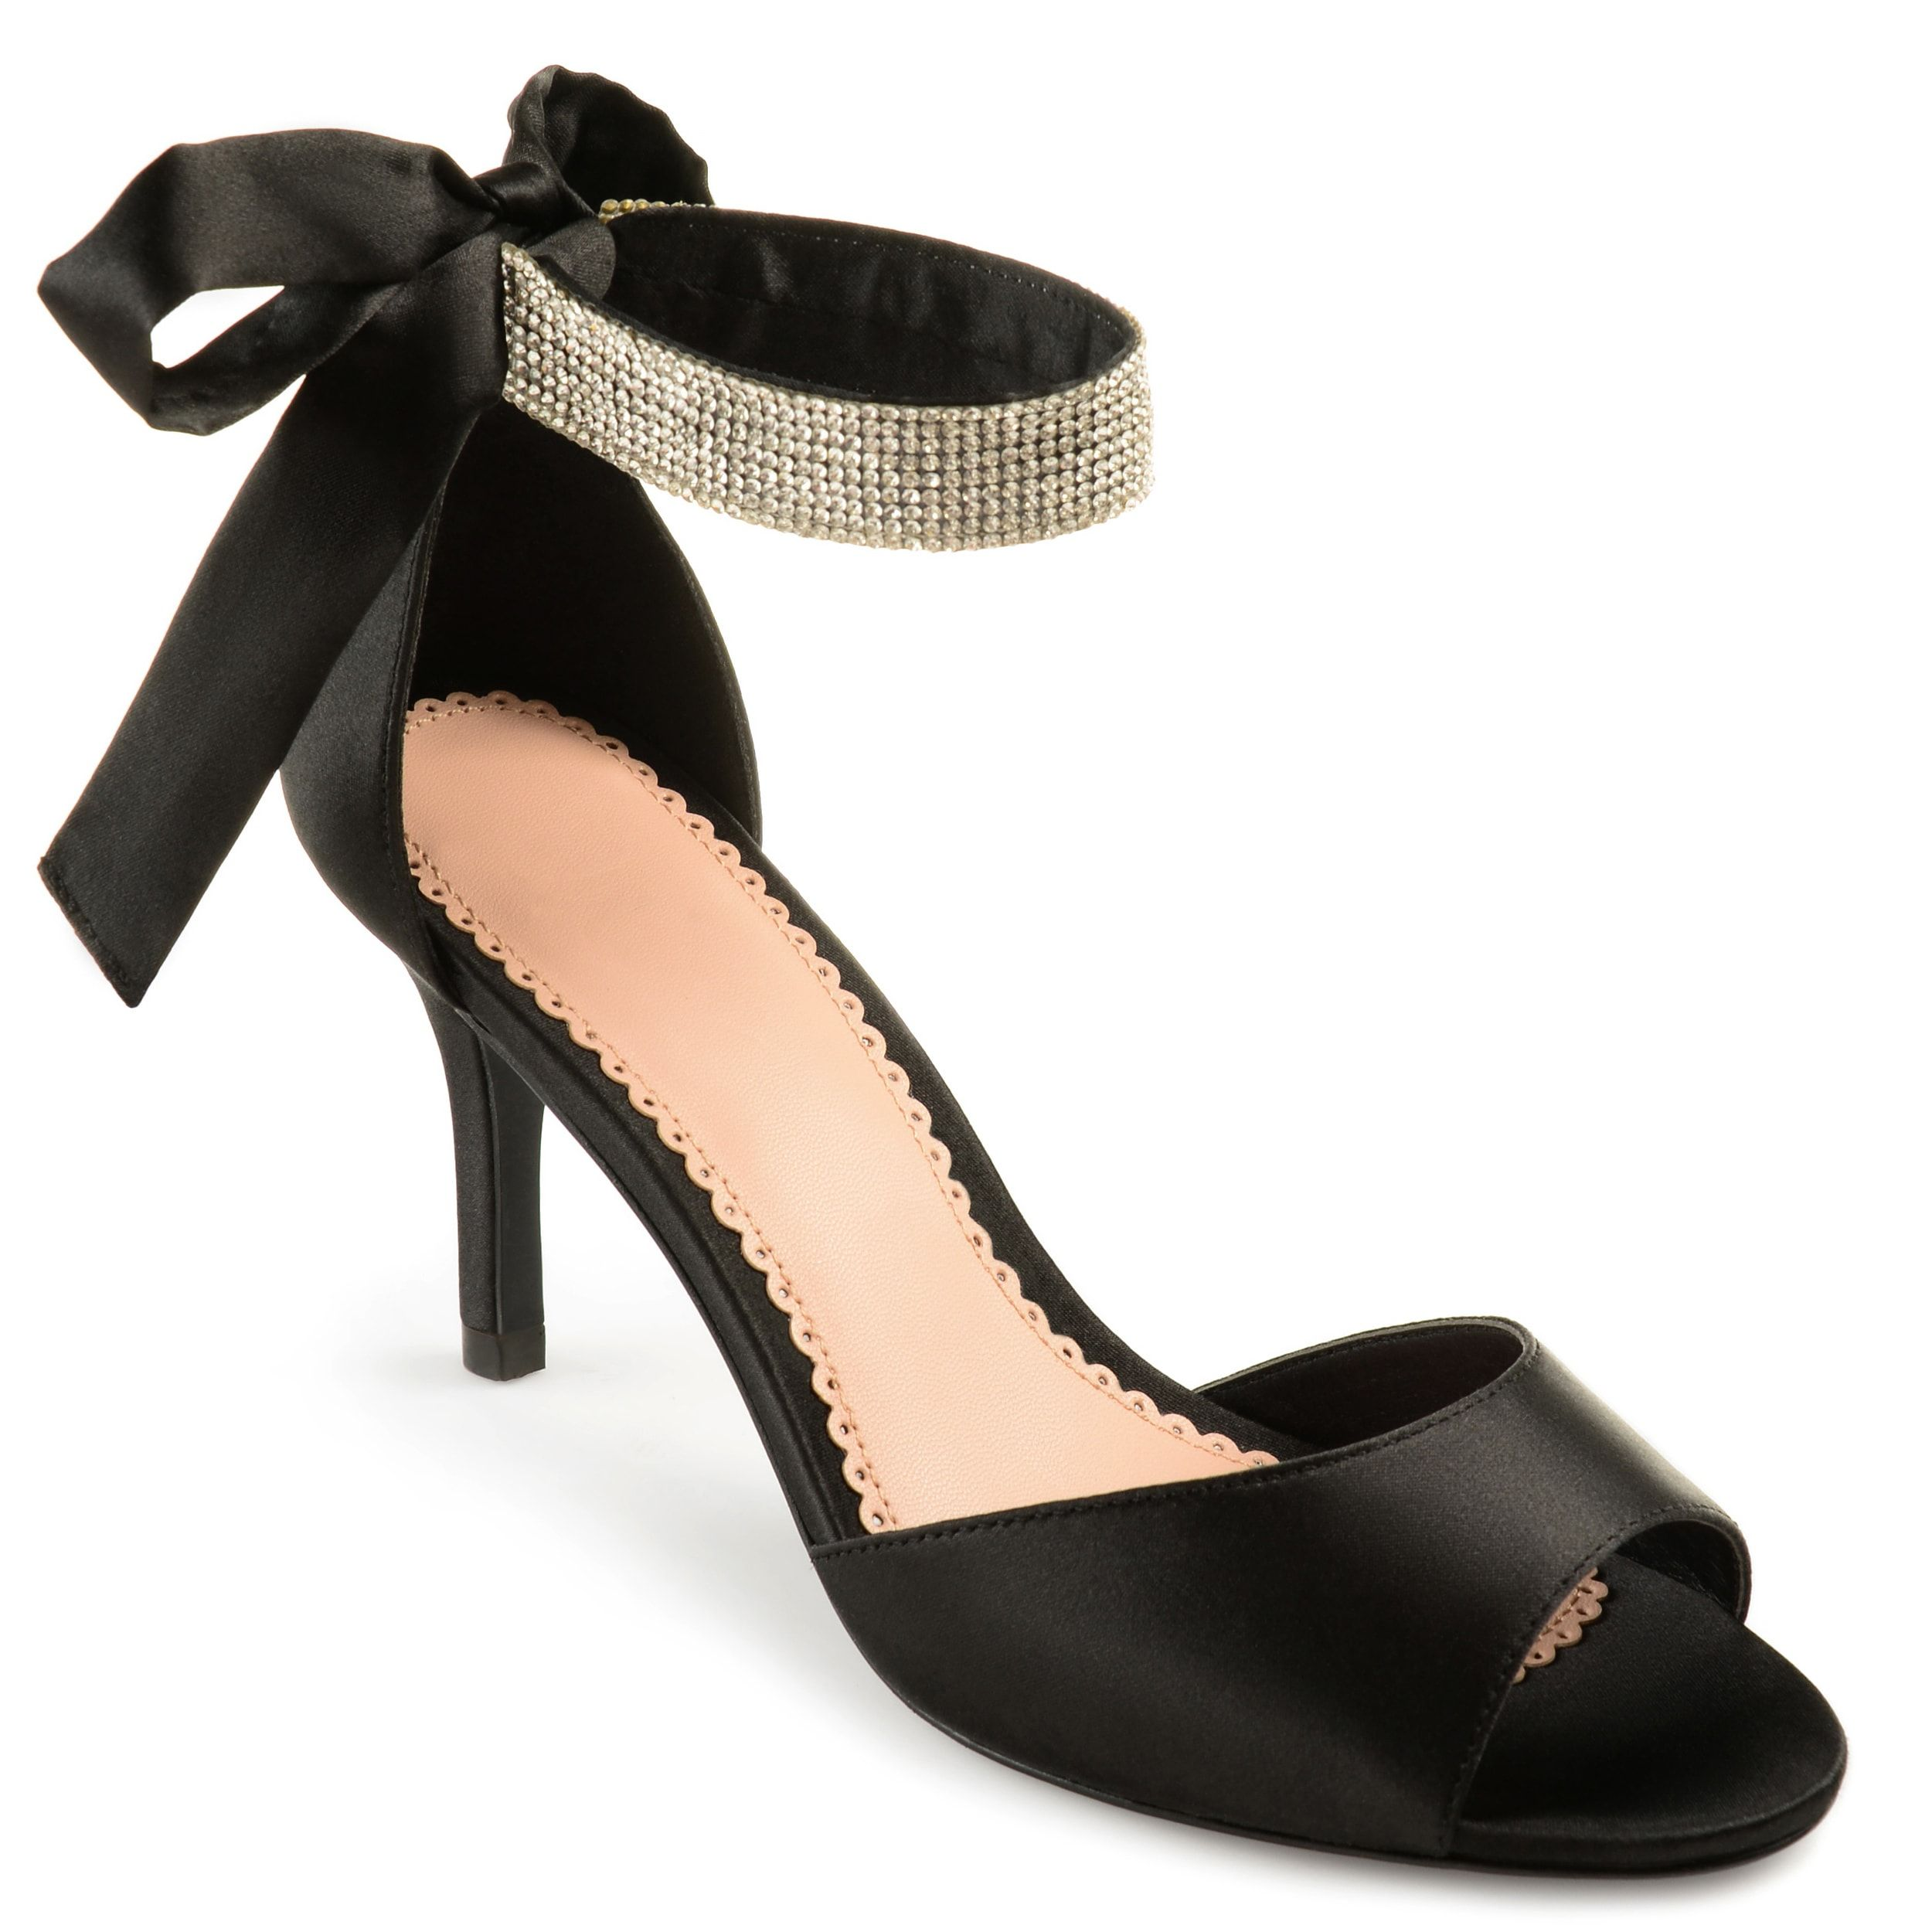 2b9bfccc3 Journee Collection Women's 'Briela' Open-toe Rhinestone Ankle Strap High  Heels (Black- 7.5), Black (satin)